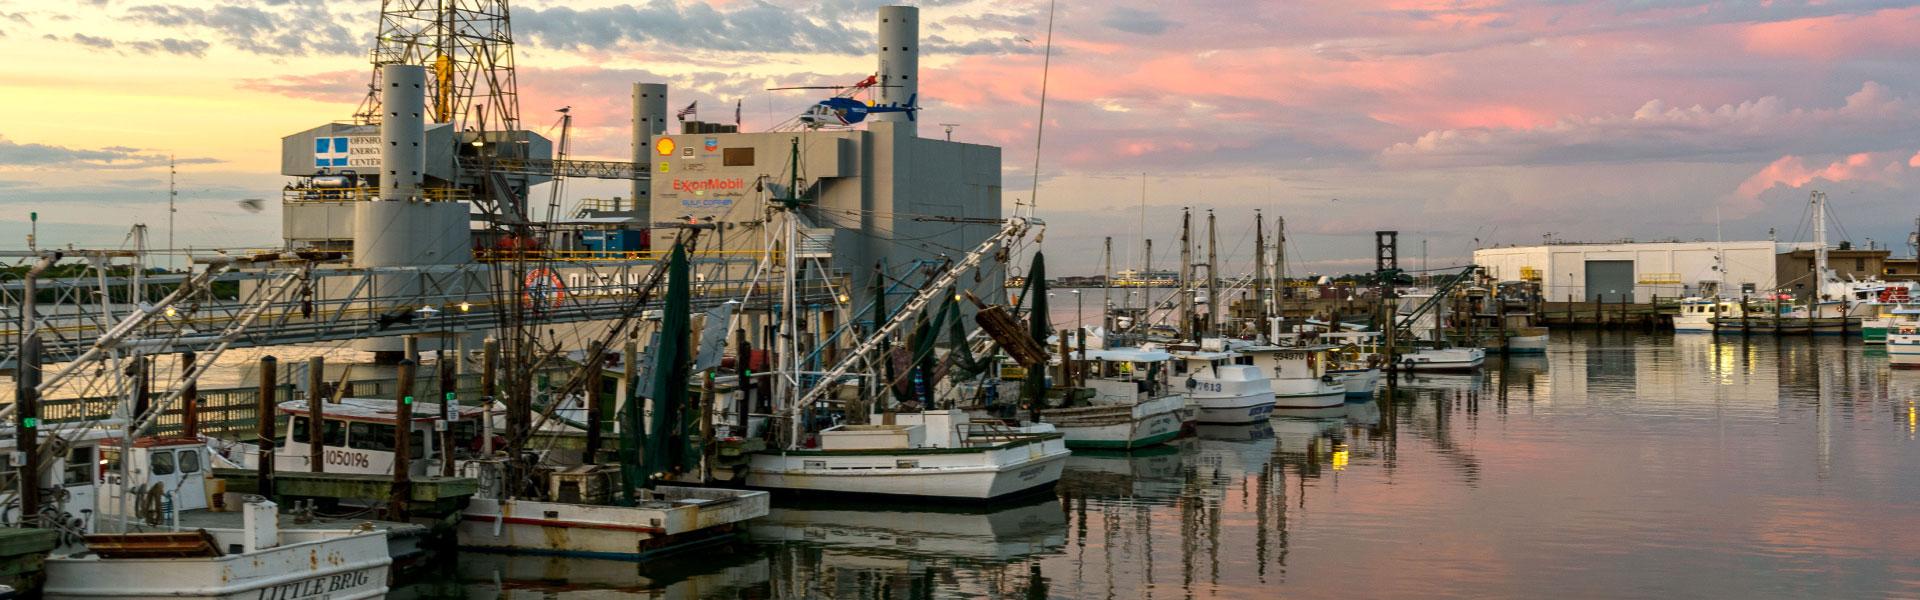 Ocean Star Offshore Drilling Rig & Museum, Galveston, TX